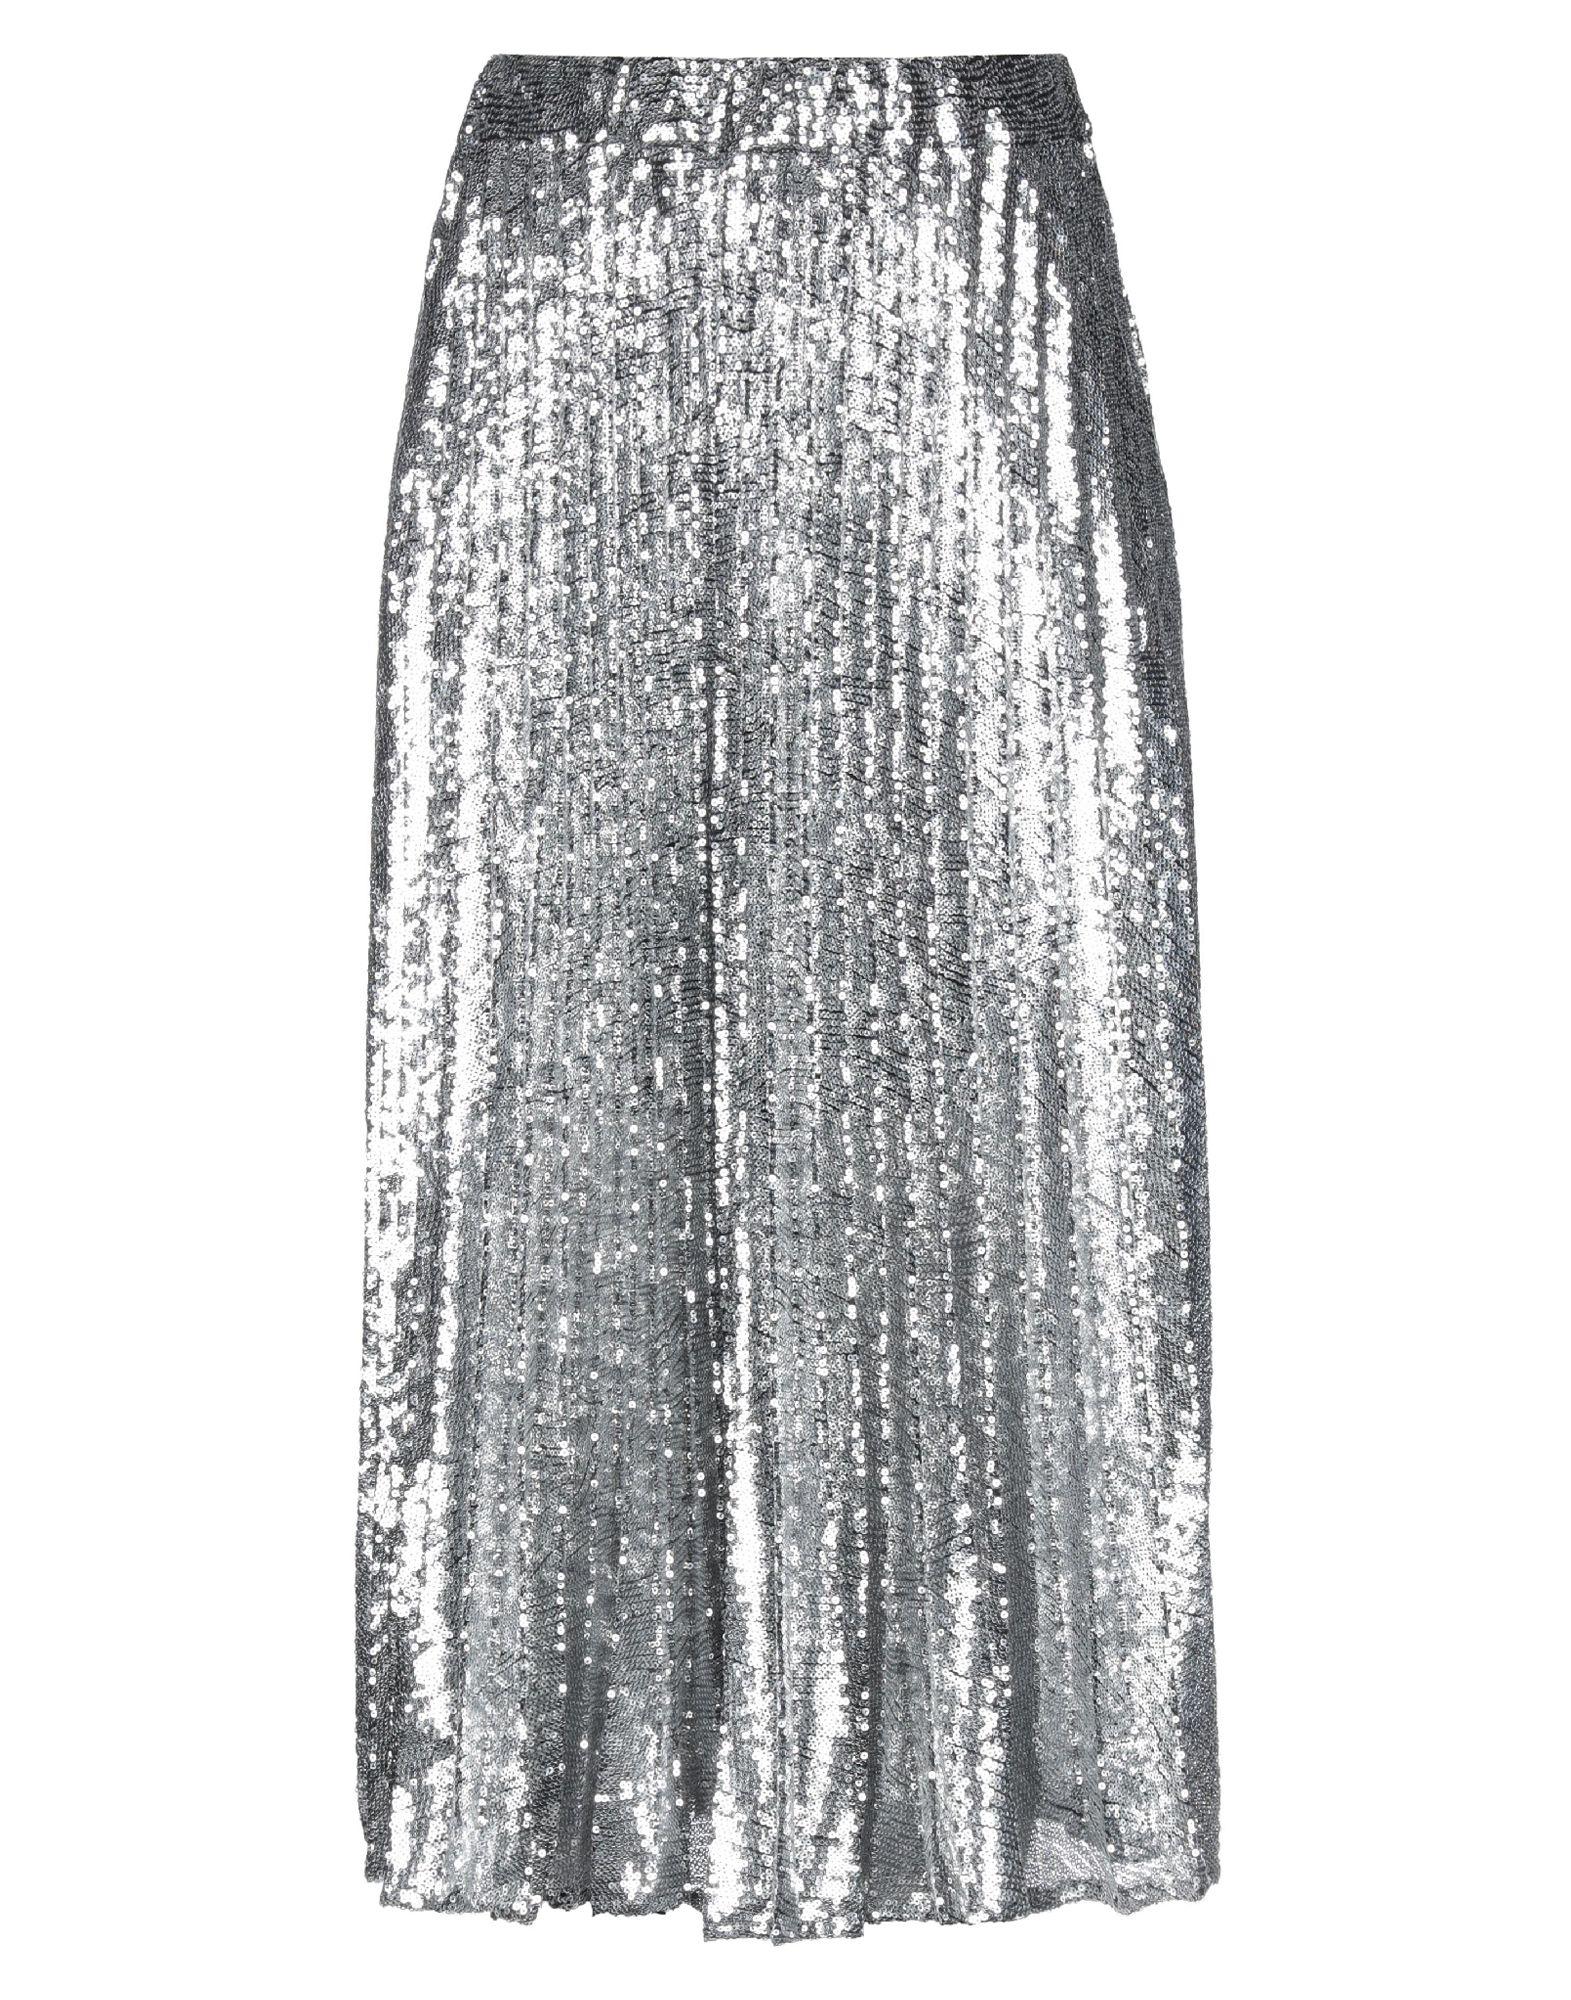 Фото - PHILOSOPHY di LORENZO SERAFINI Юбка длиной 3/4 philosophy di lorenzo serafini юбка